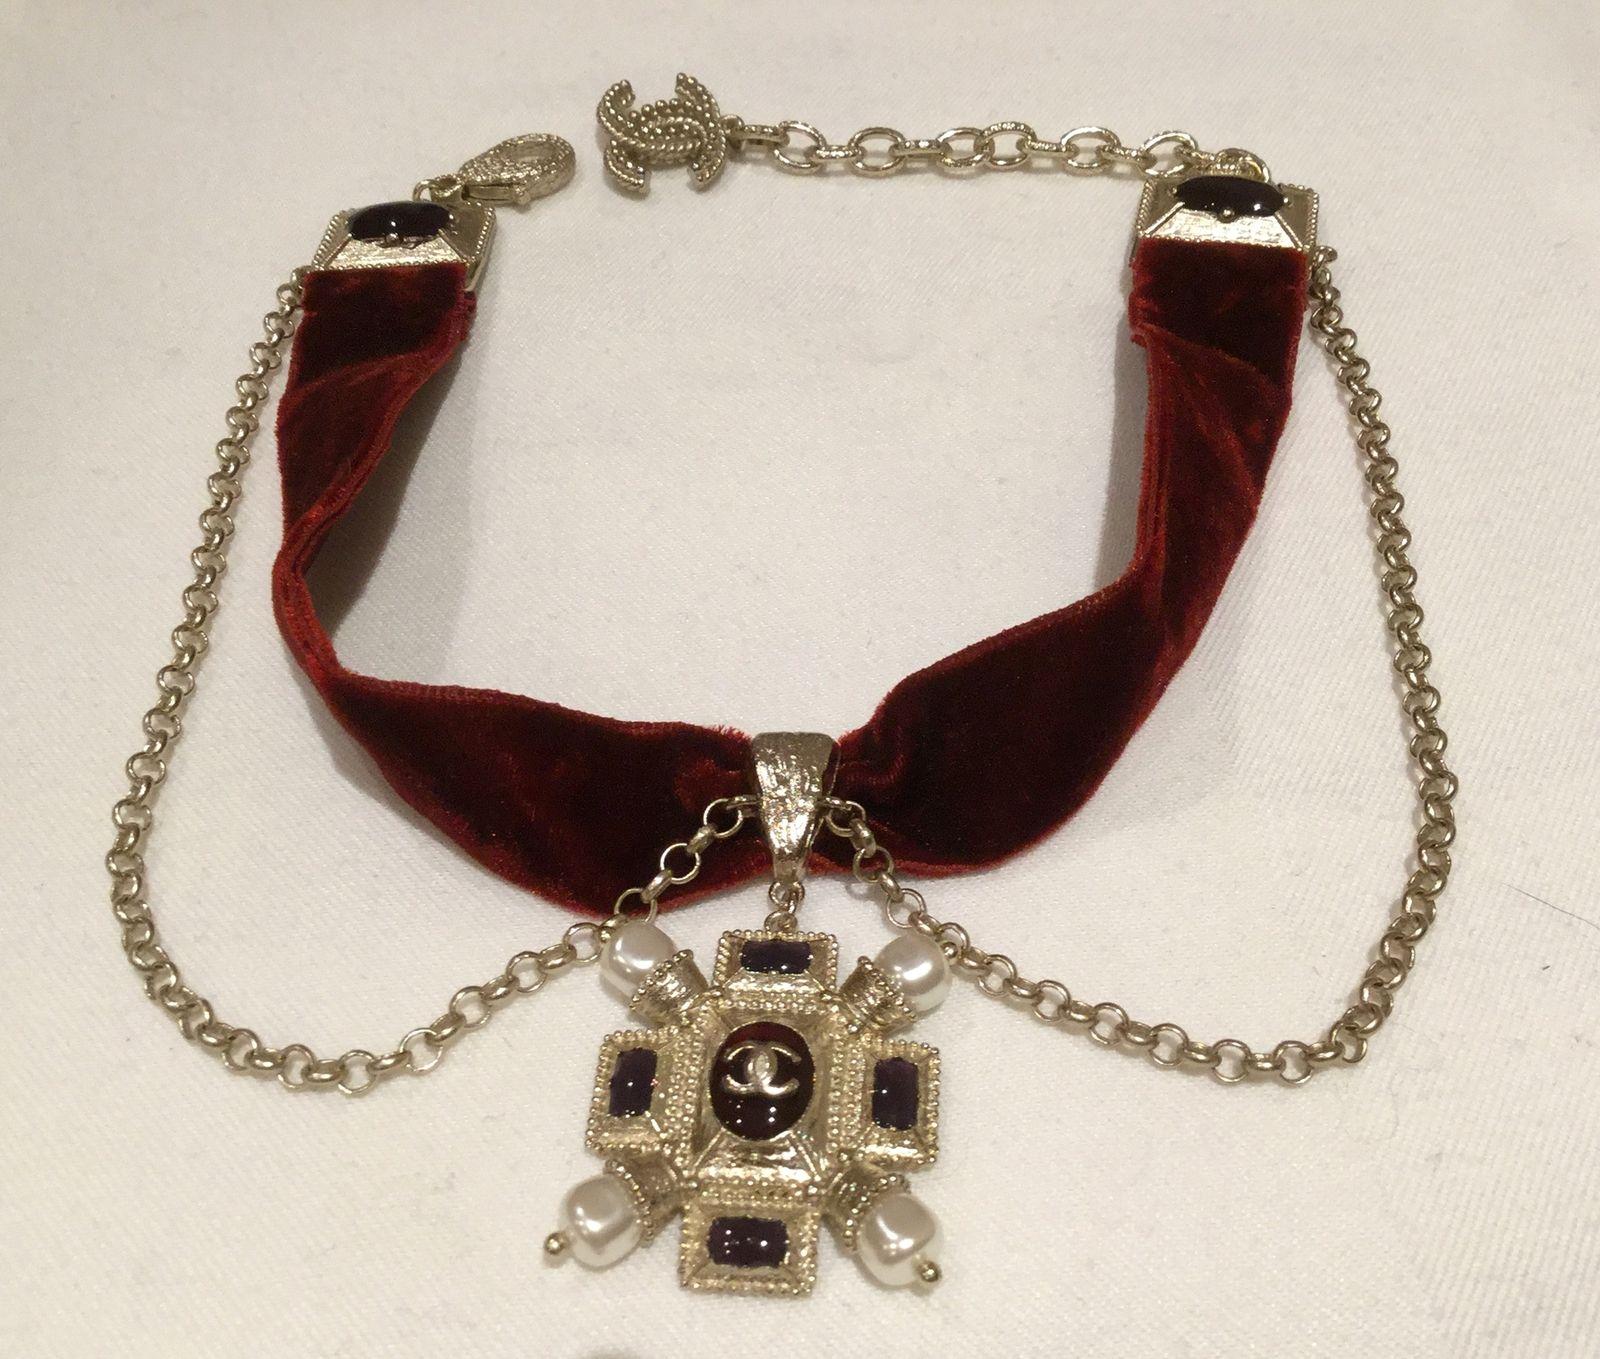 Rare chanel red velvet choker necklace brushed finish jewel pendant rare chanel red velvet choker necklace brushed finish jewel pendant gold chain retro aloadofball Choice Image